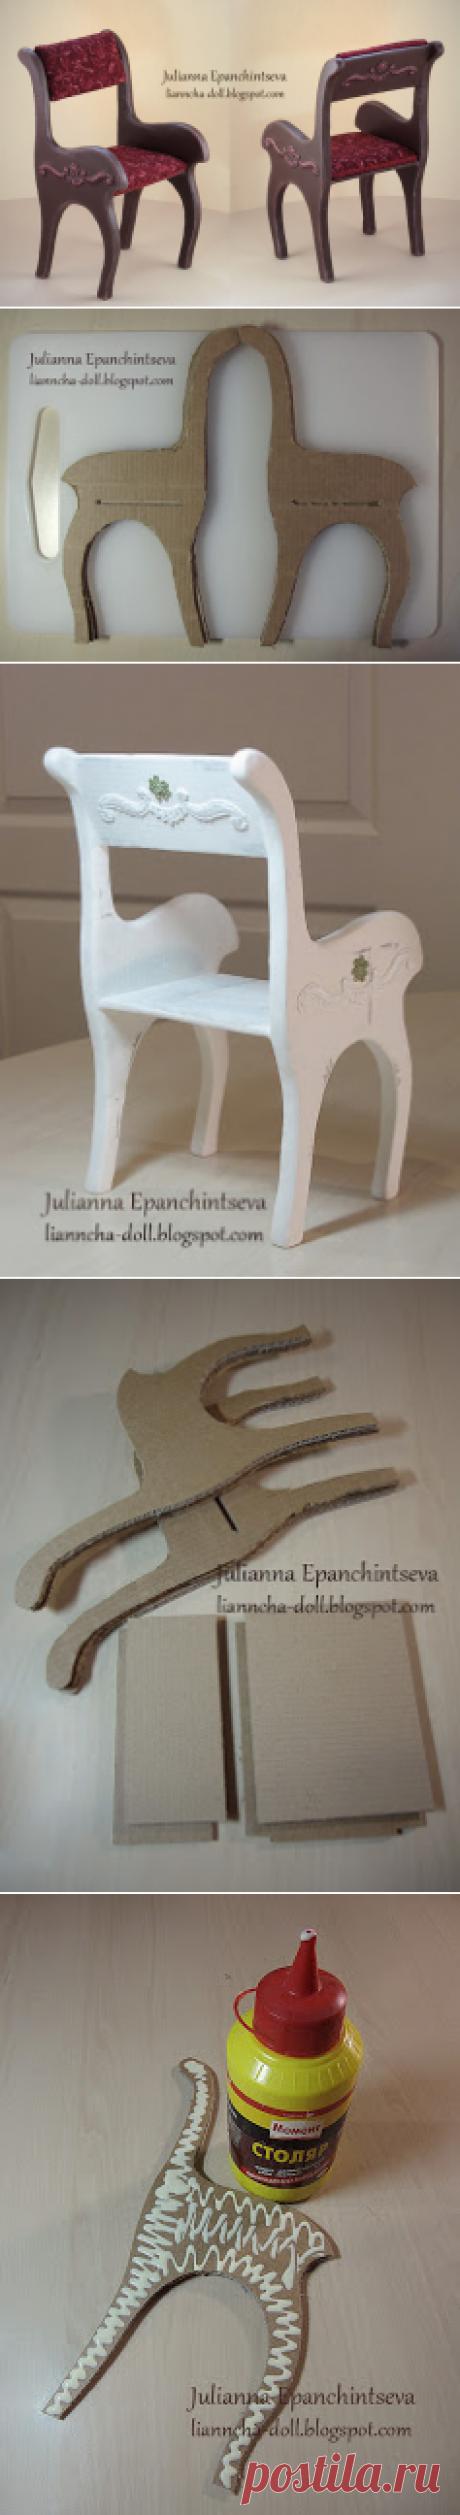 Doll furniture. Chair. Yulianna Epanchintseva's MK